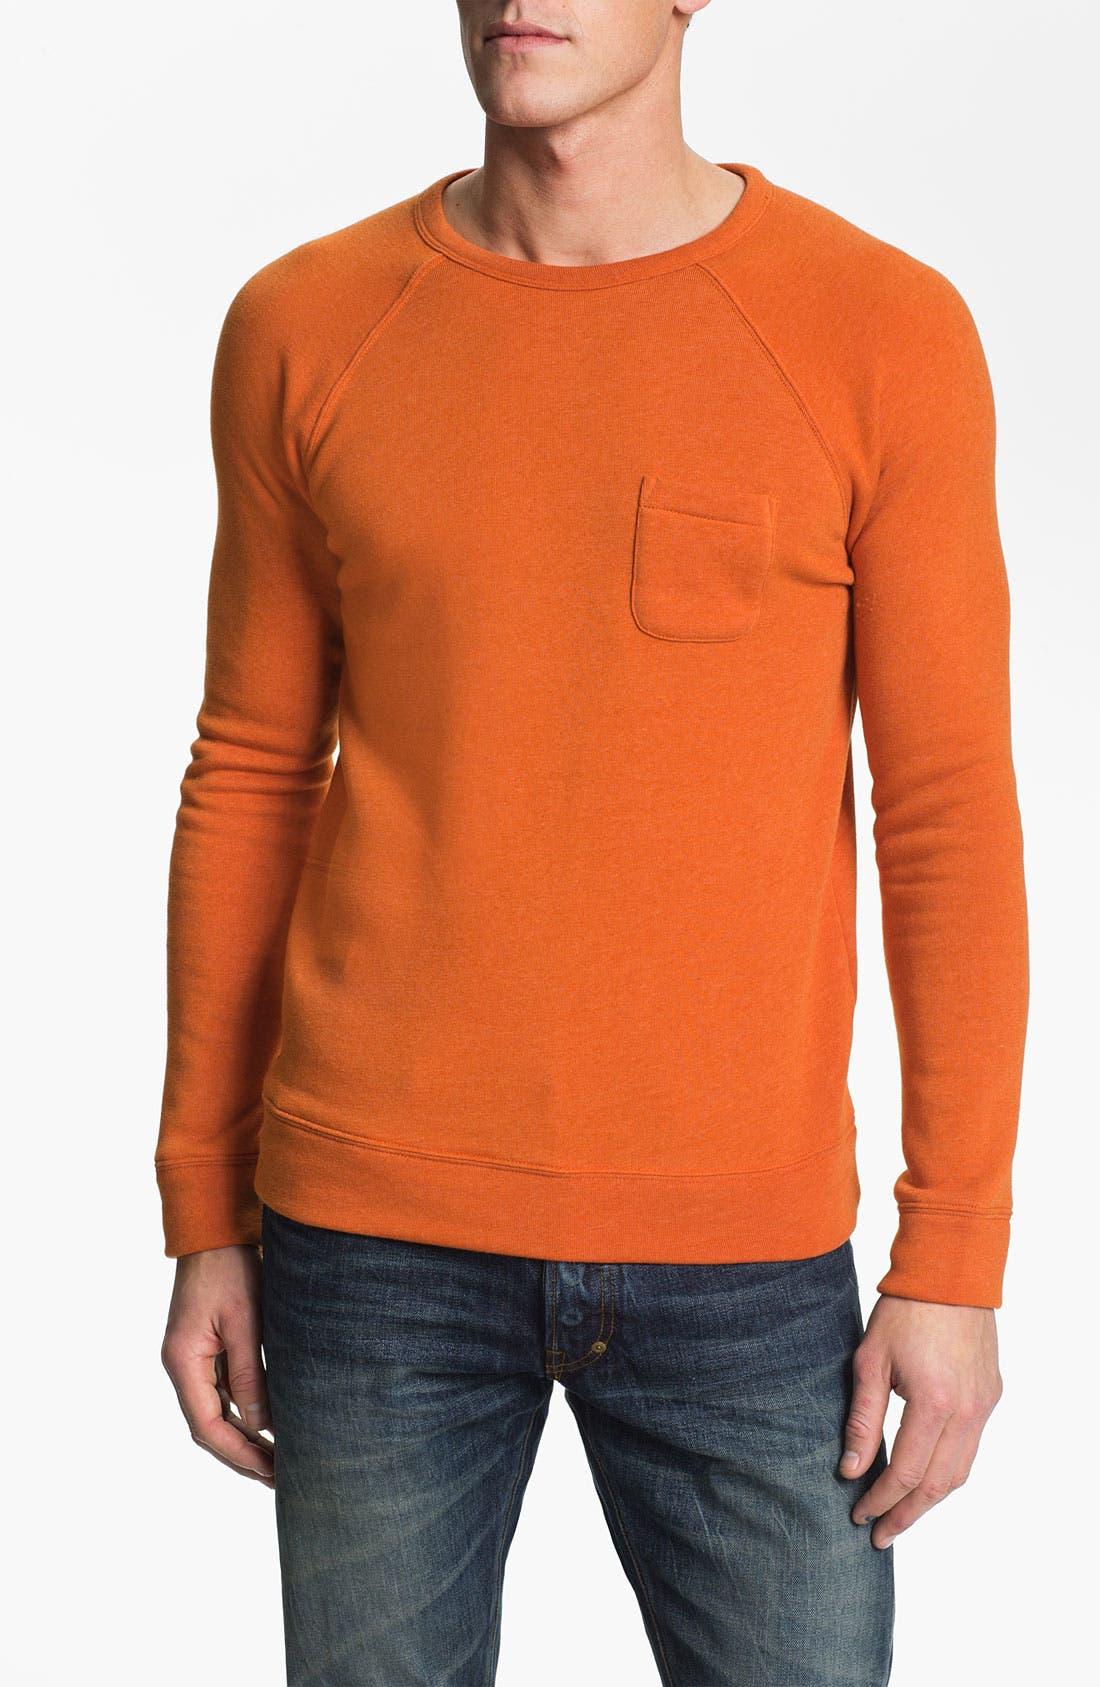 Alternate Image 1 Selected - Obey Lofty Creature Comforts Crewneck Sweatshirt